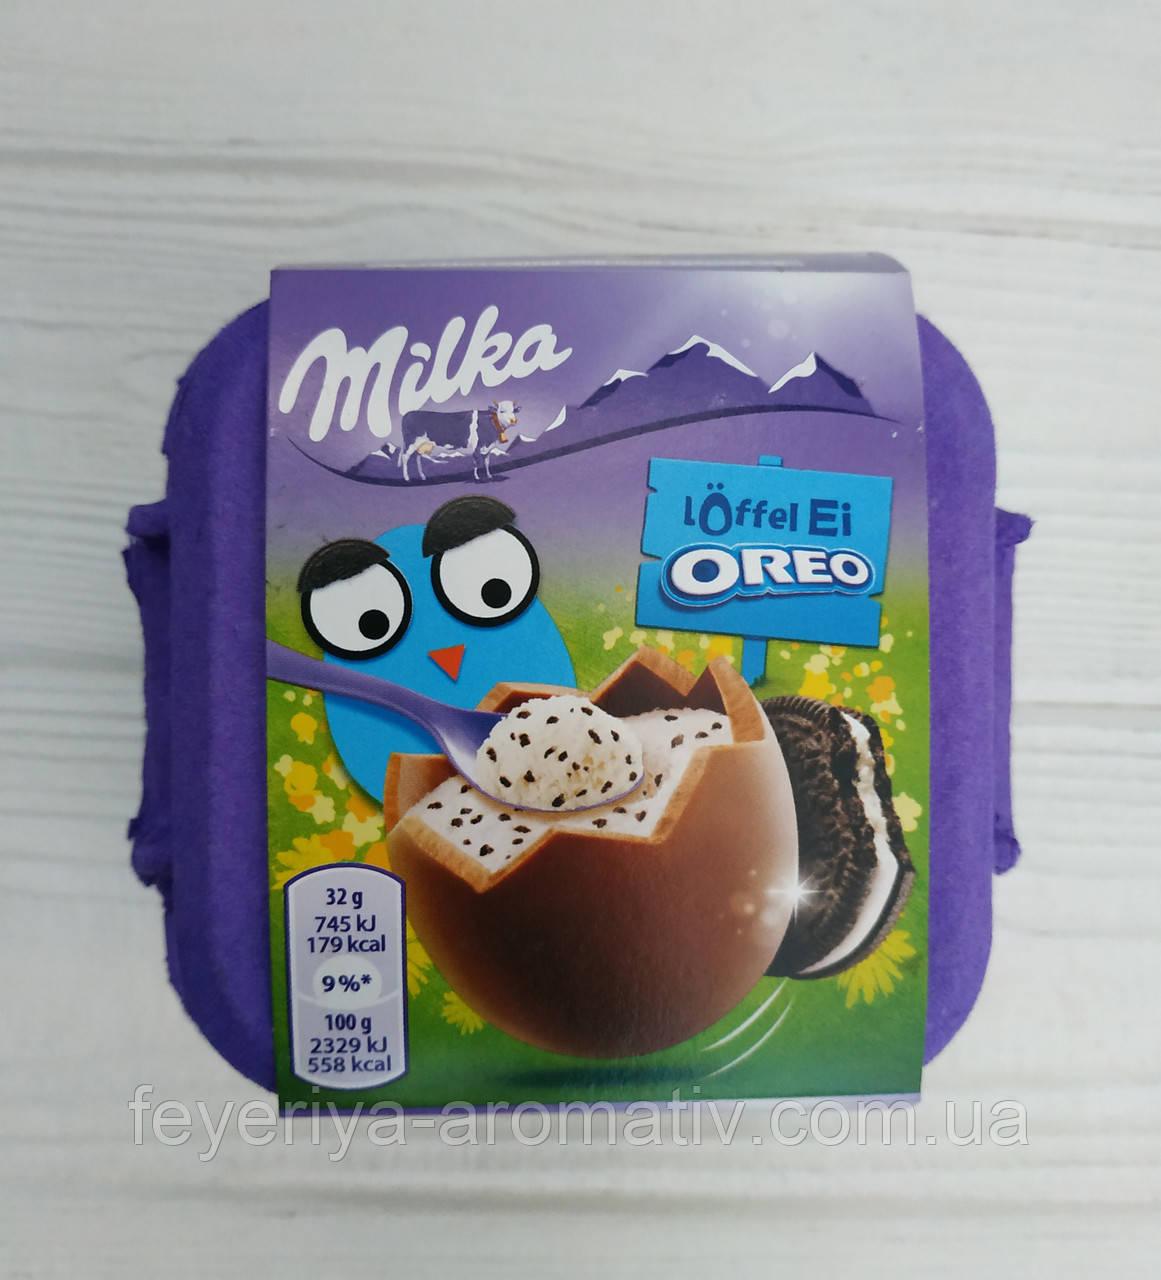 Шоколадные яйца с молочной начинкой Milka loffel Ei Oreo 4x32гр  (Швейцария)